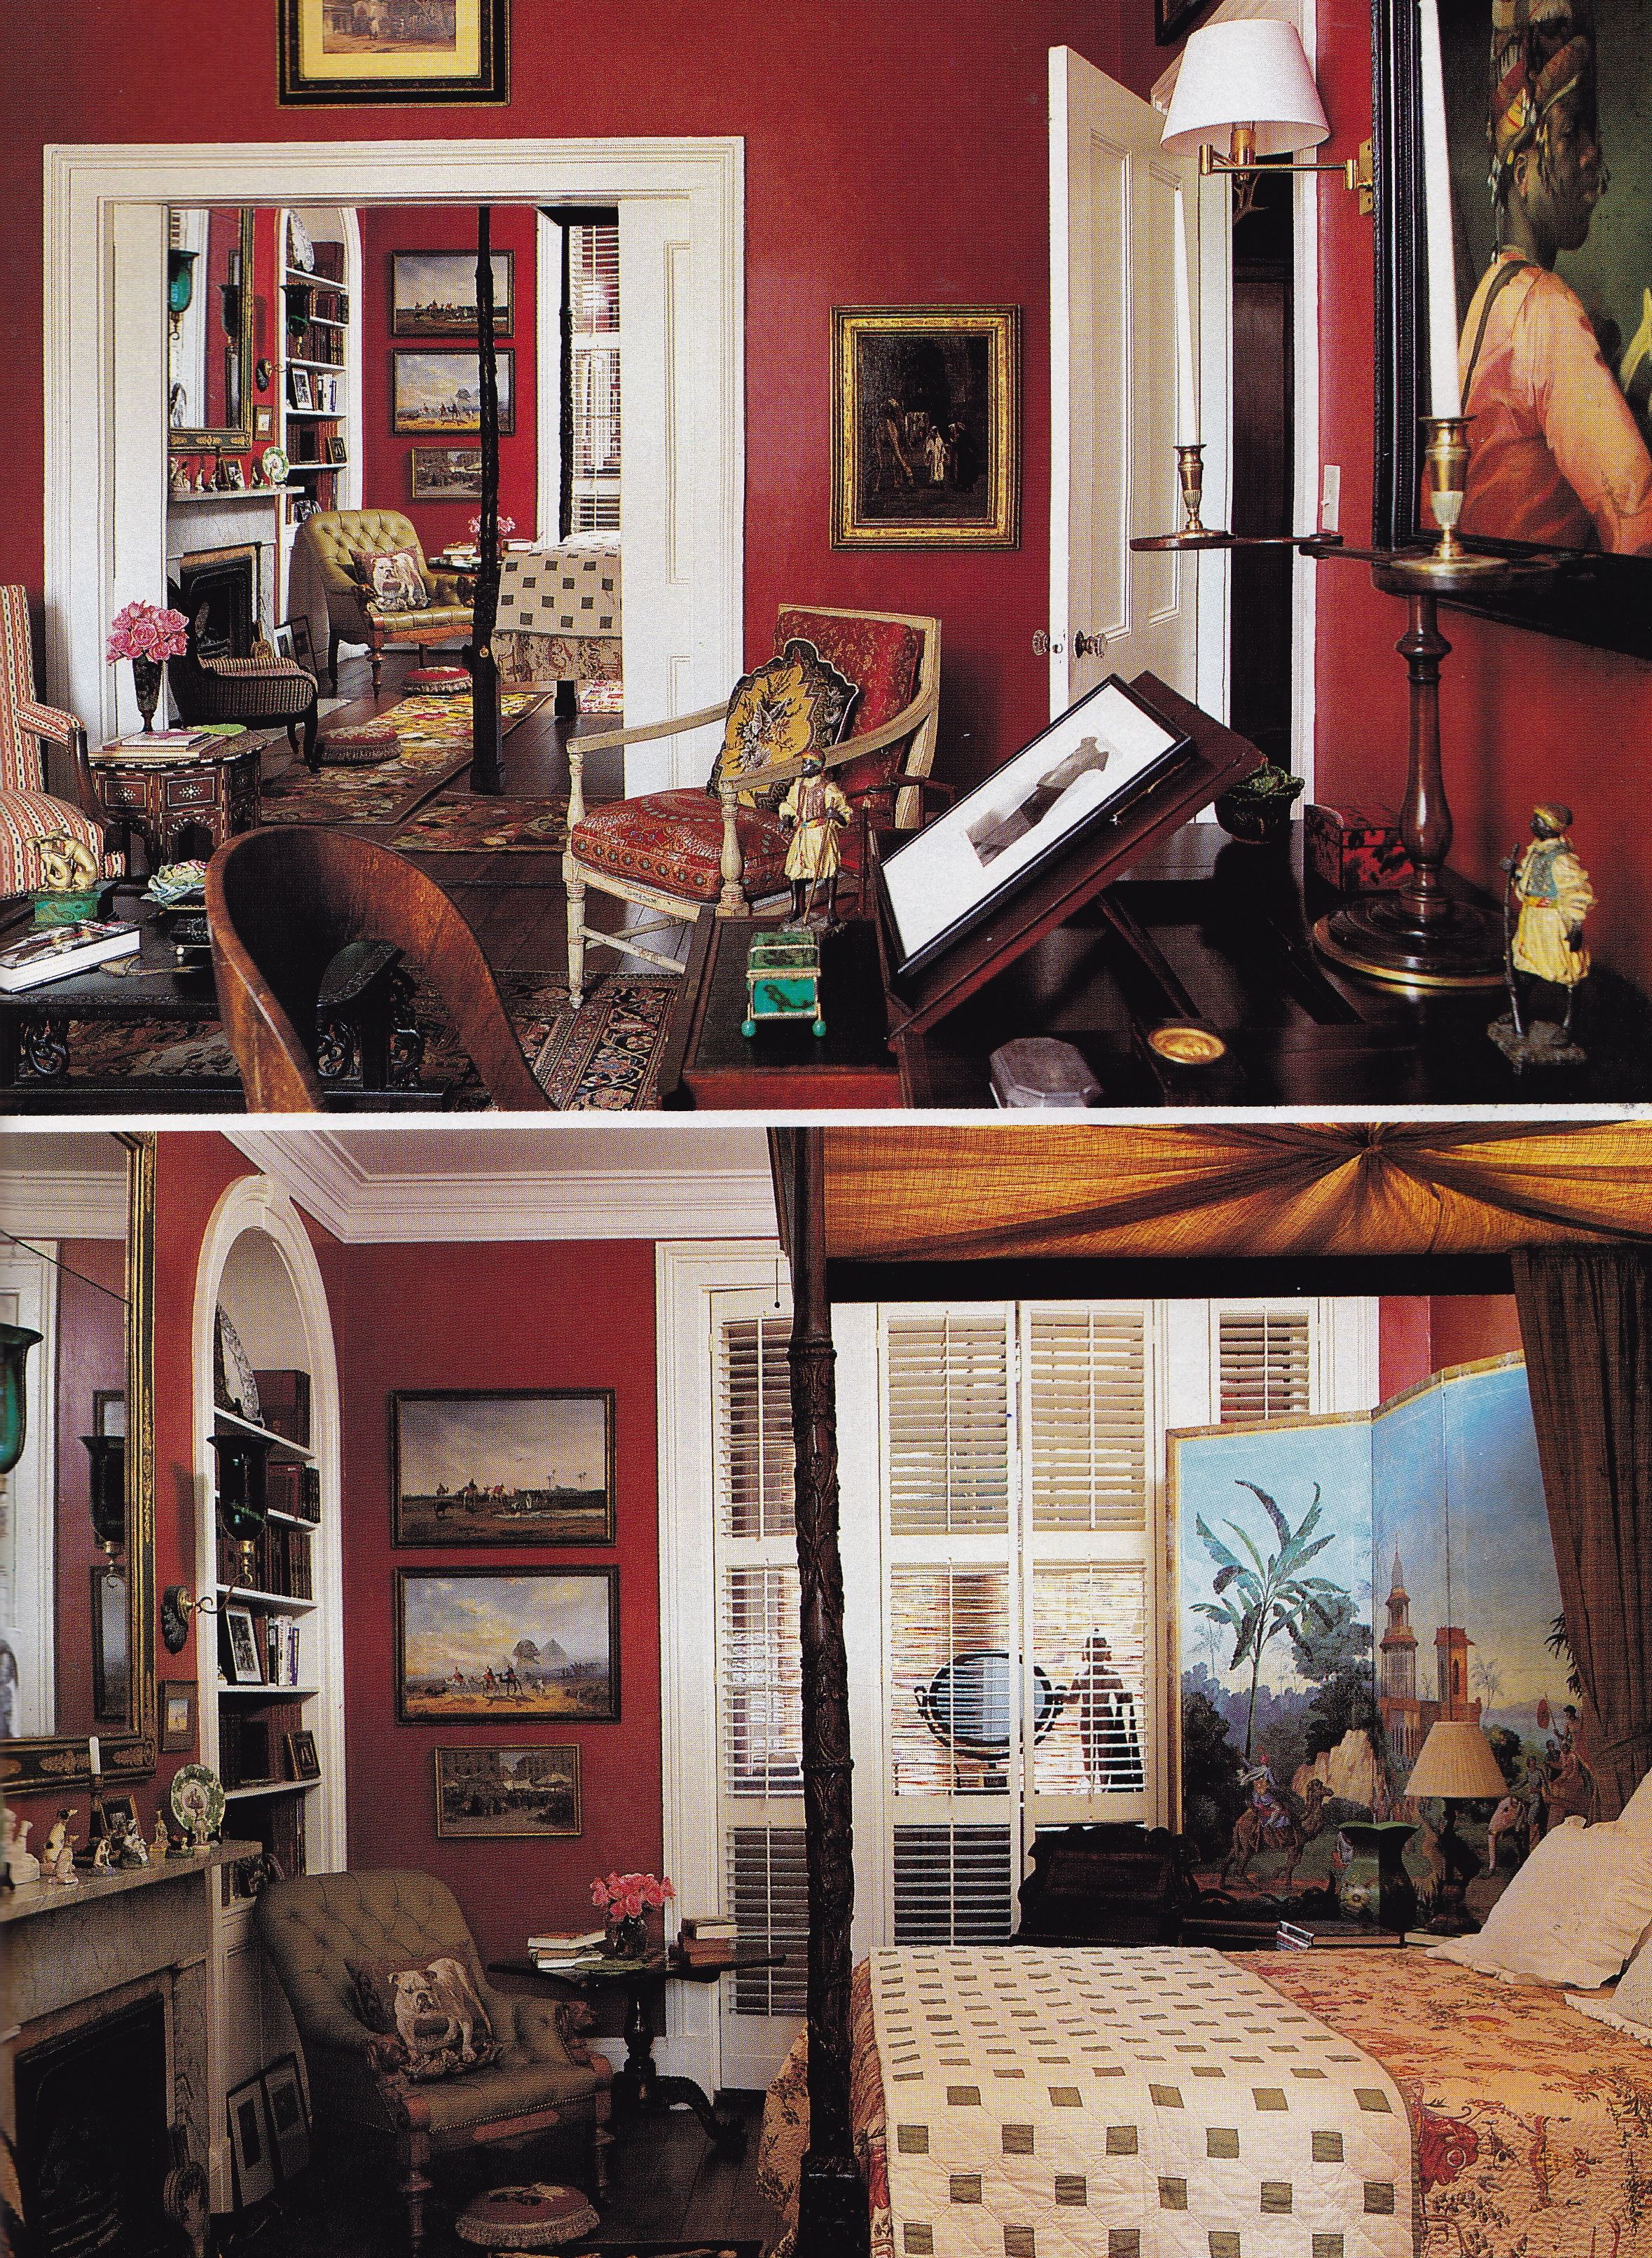 John Rosi Furlow Gatewood Savannah Hg July 1992 Oberto Gili Wall Paint